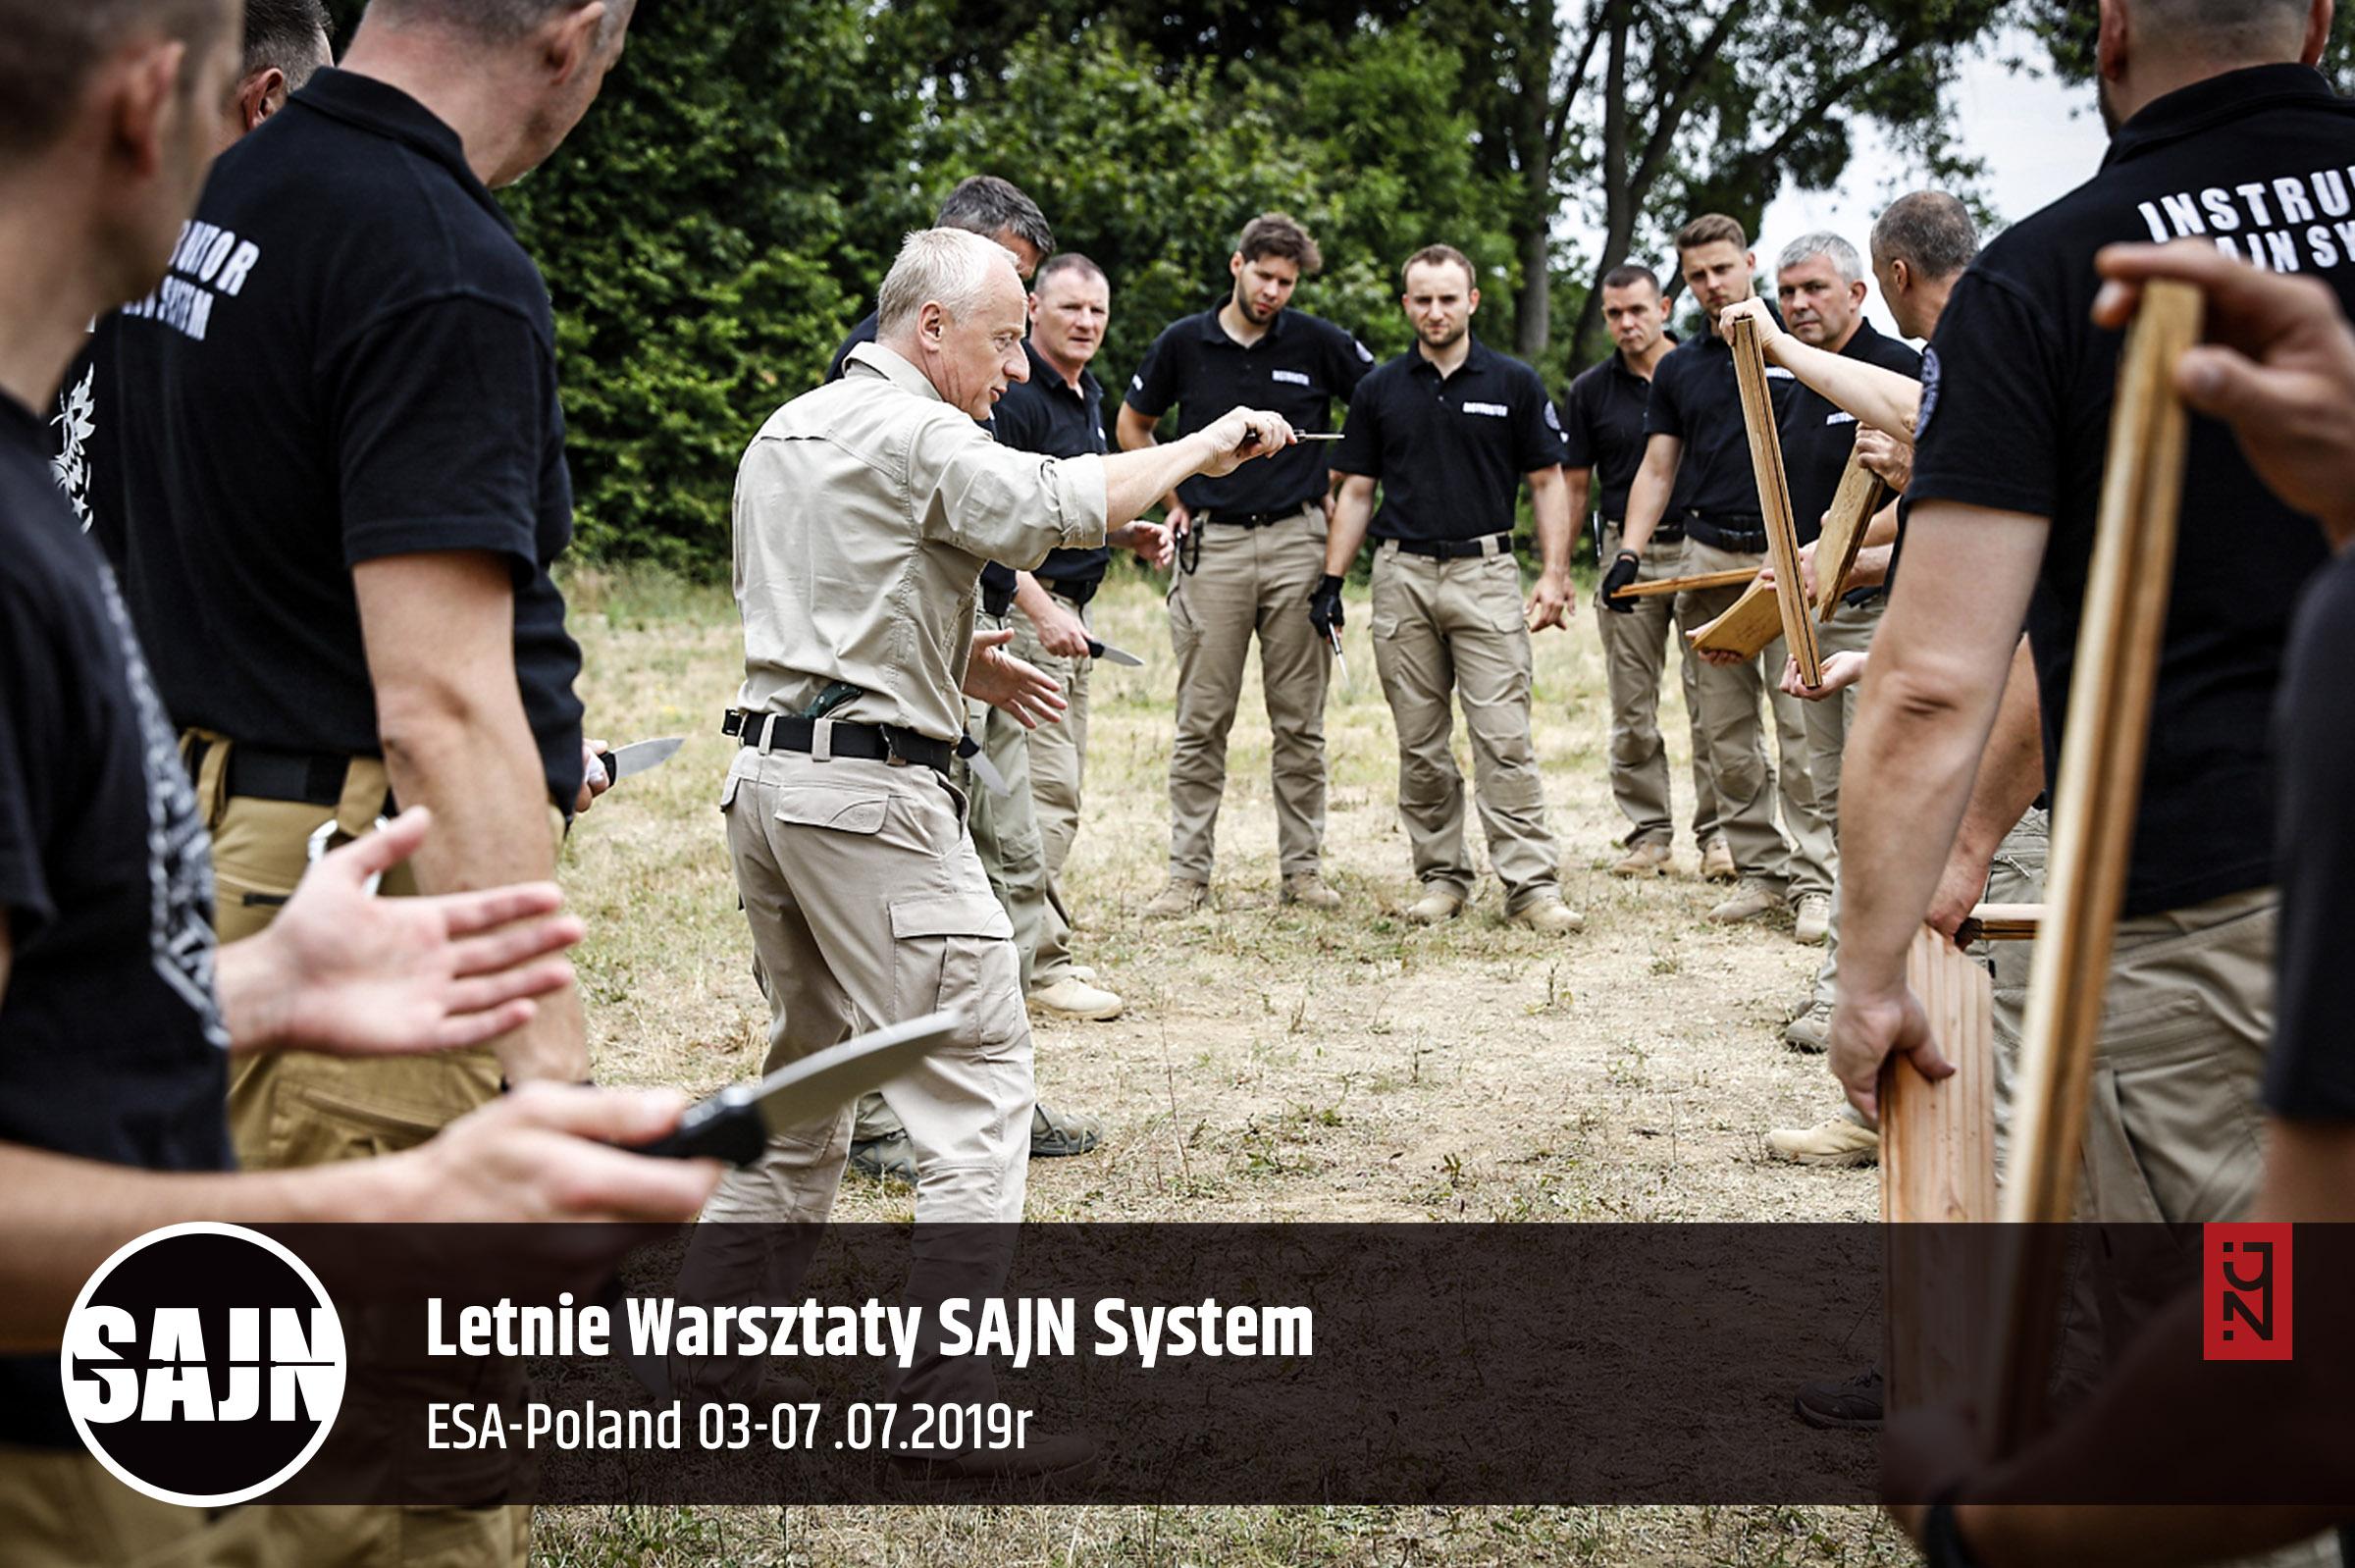 jan nycek_sajn_szkolenie sluzb mundurowych_palka teleskopowa_noz_samoobrona_dosan_2.jpg